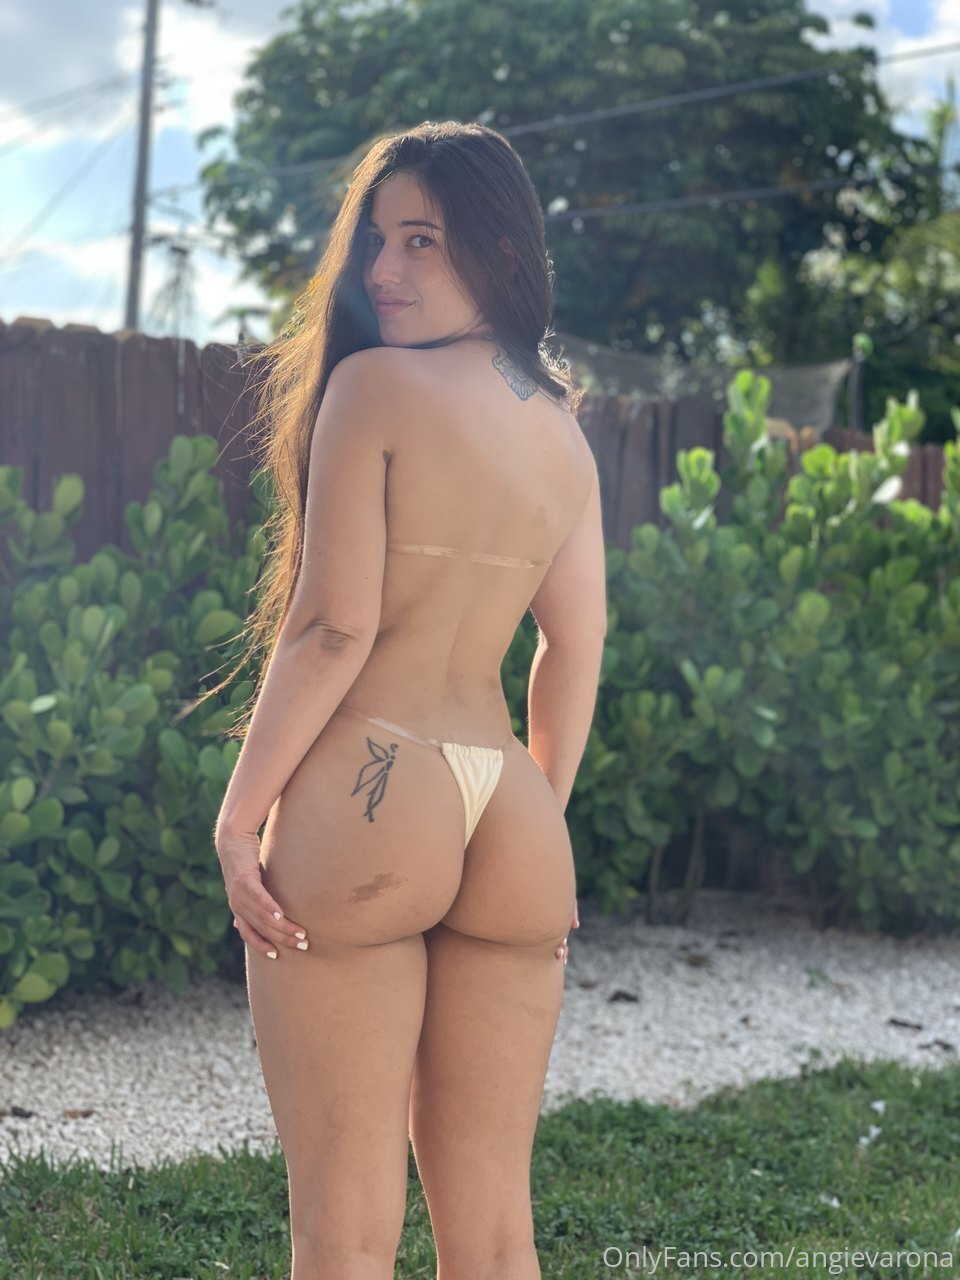 Angie Varona Onlyfans 0046